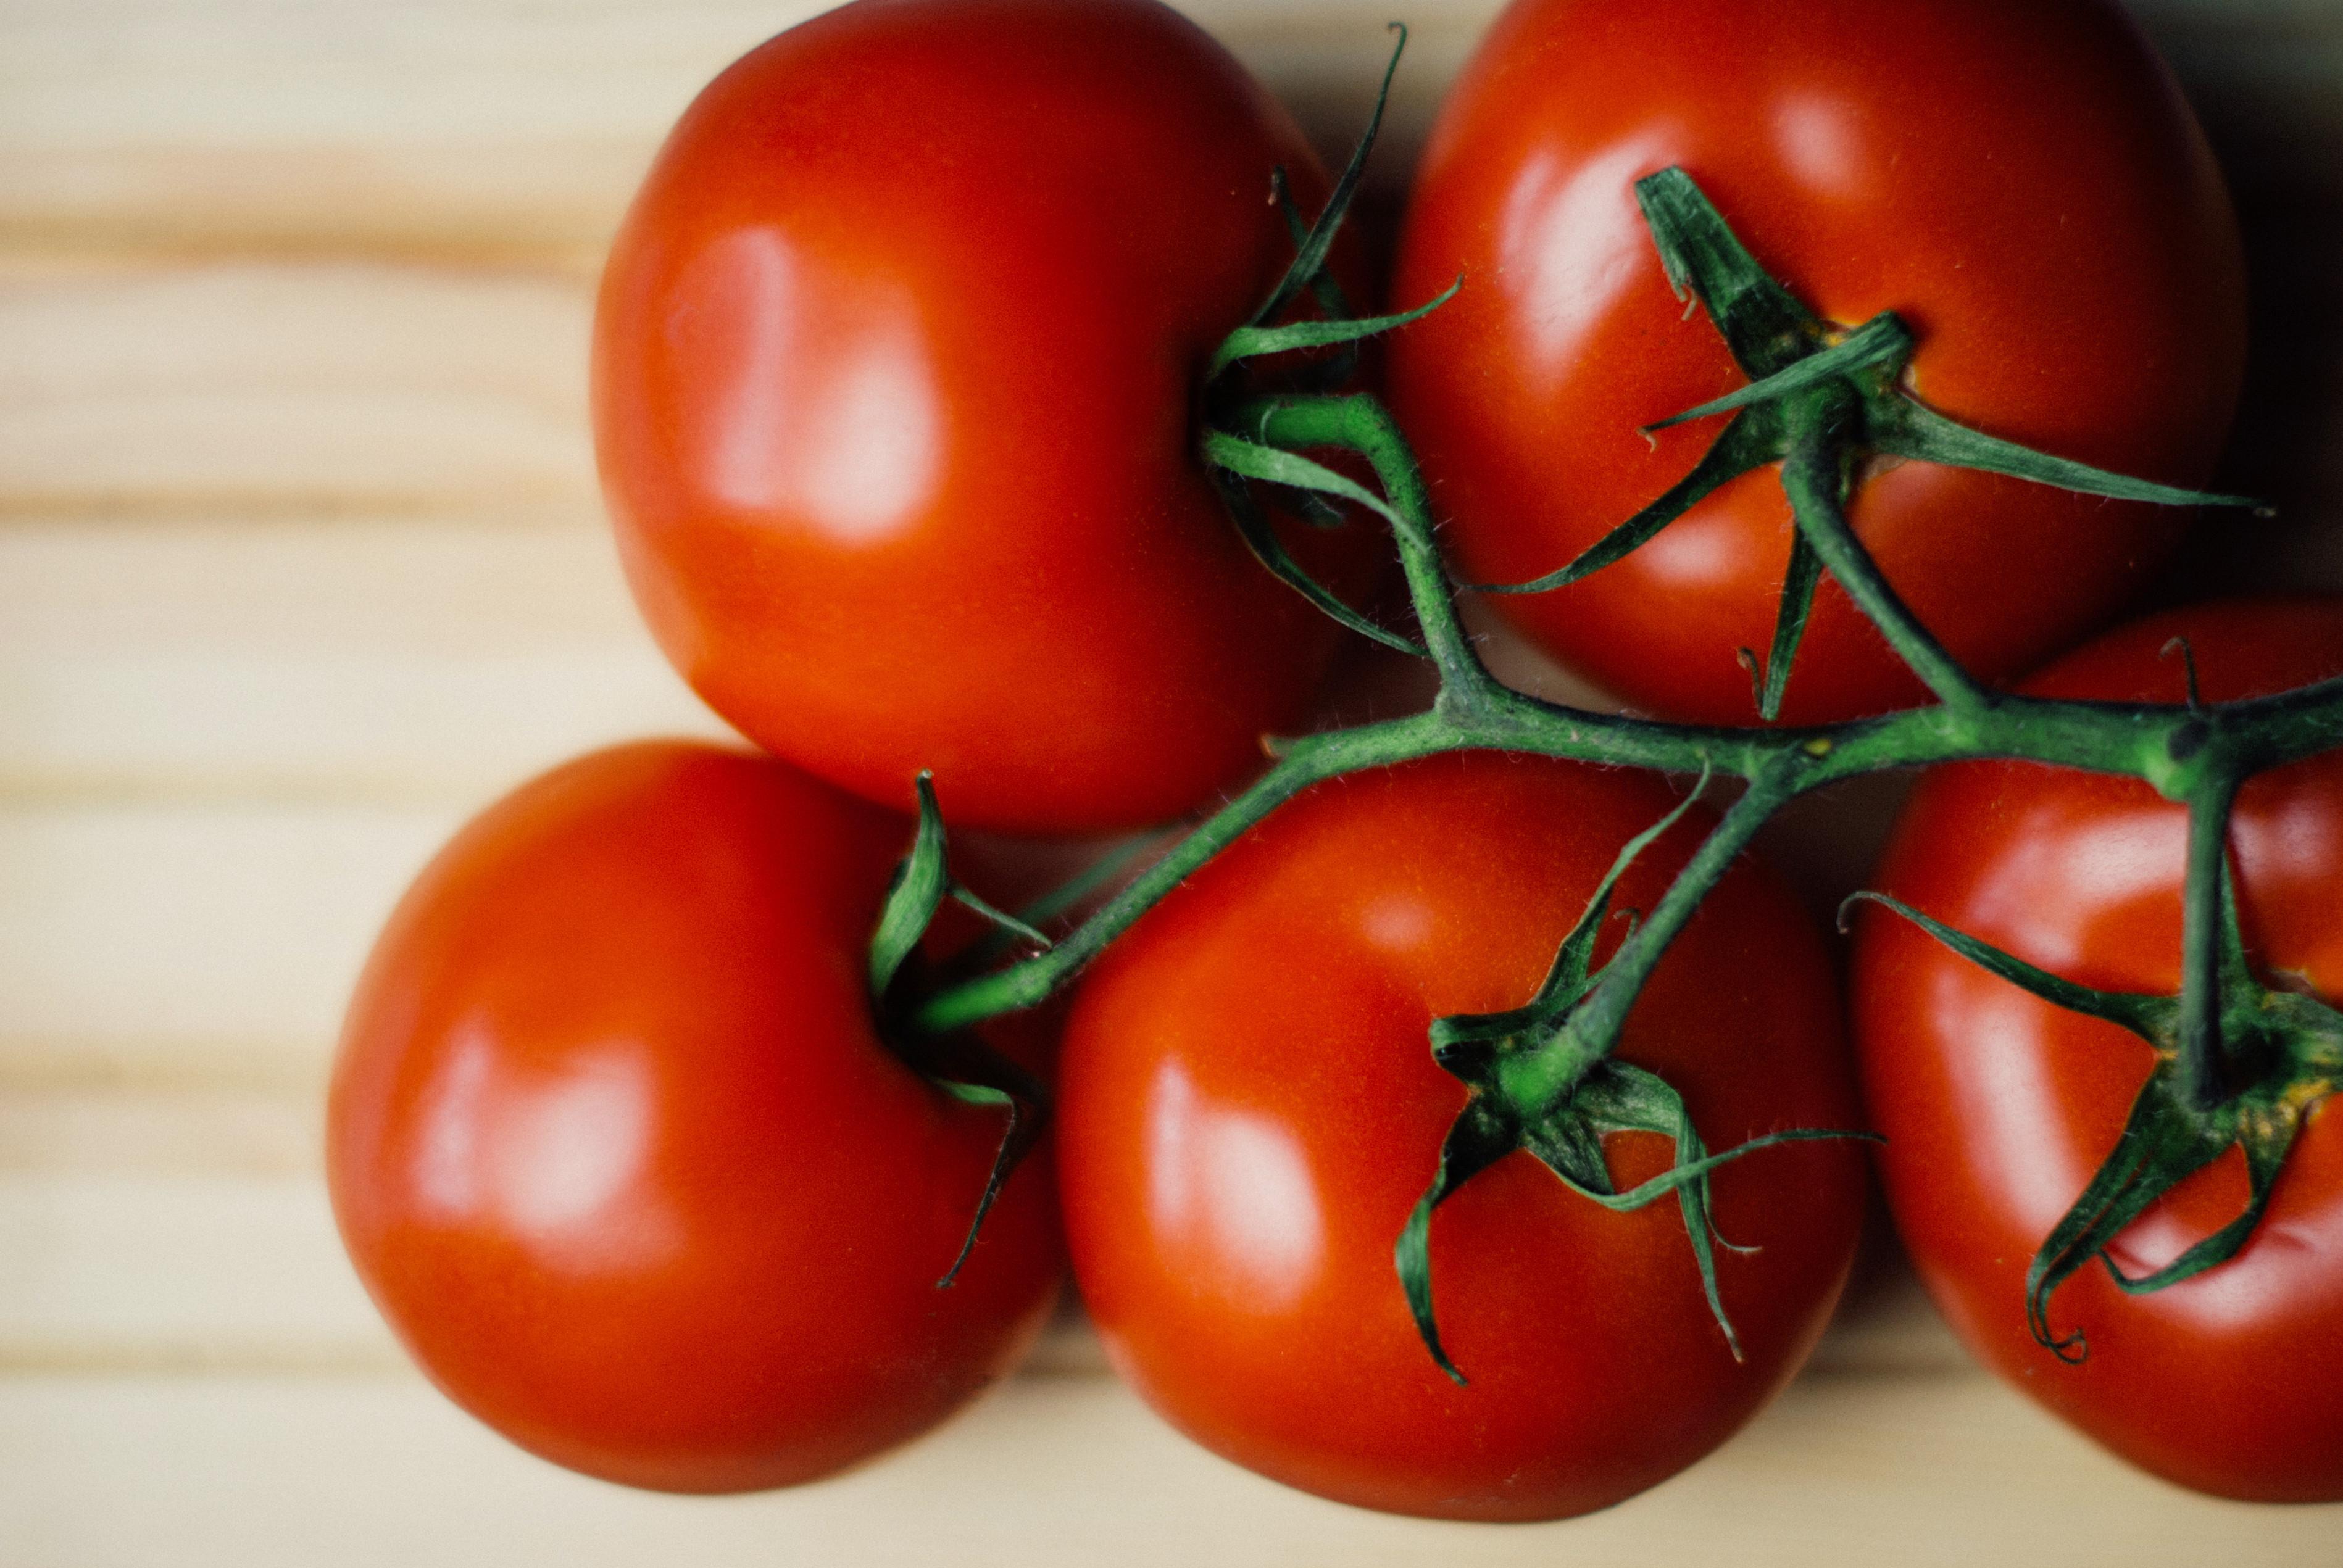 番茄(圖/翻攝自librestock)